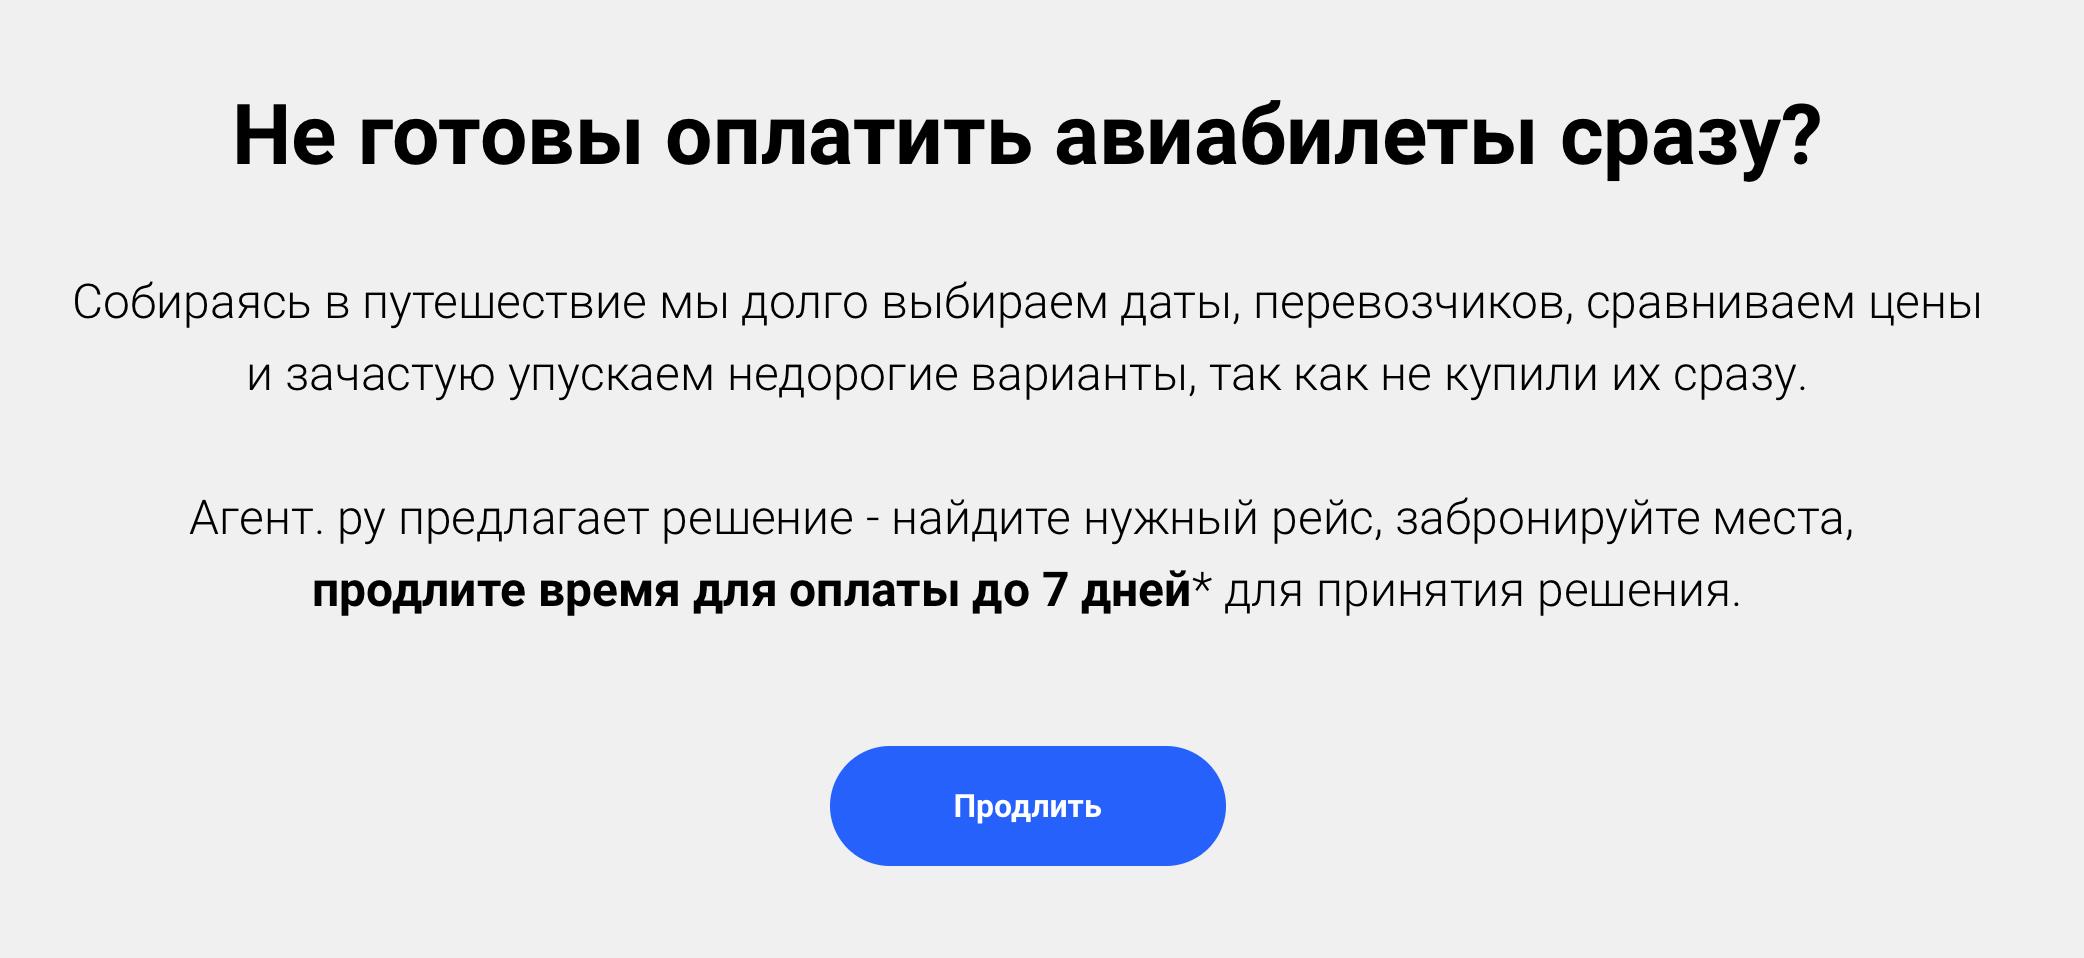 Авиабилеты киев тбилиси цена